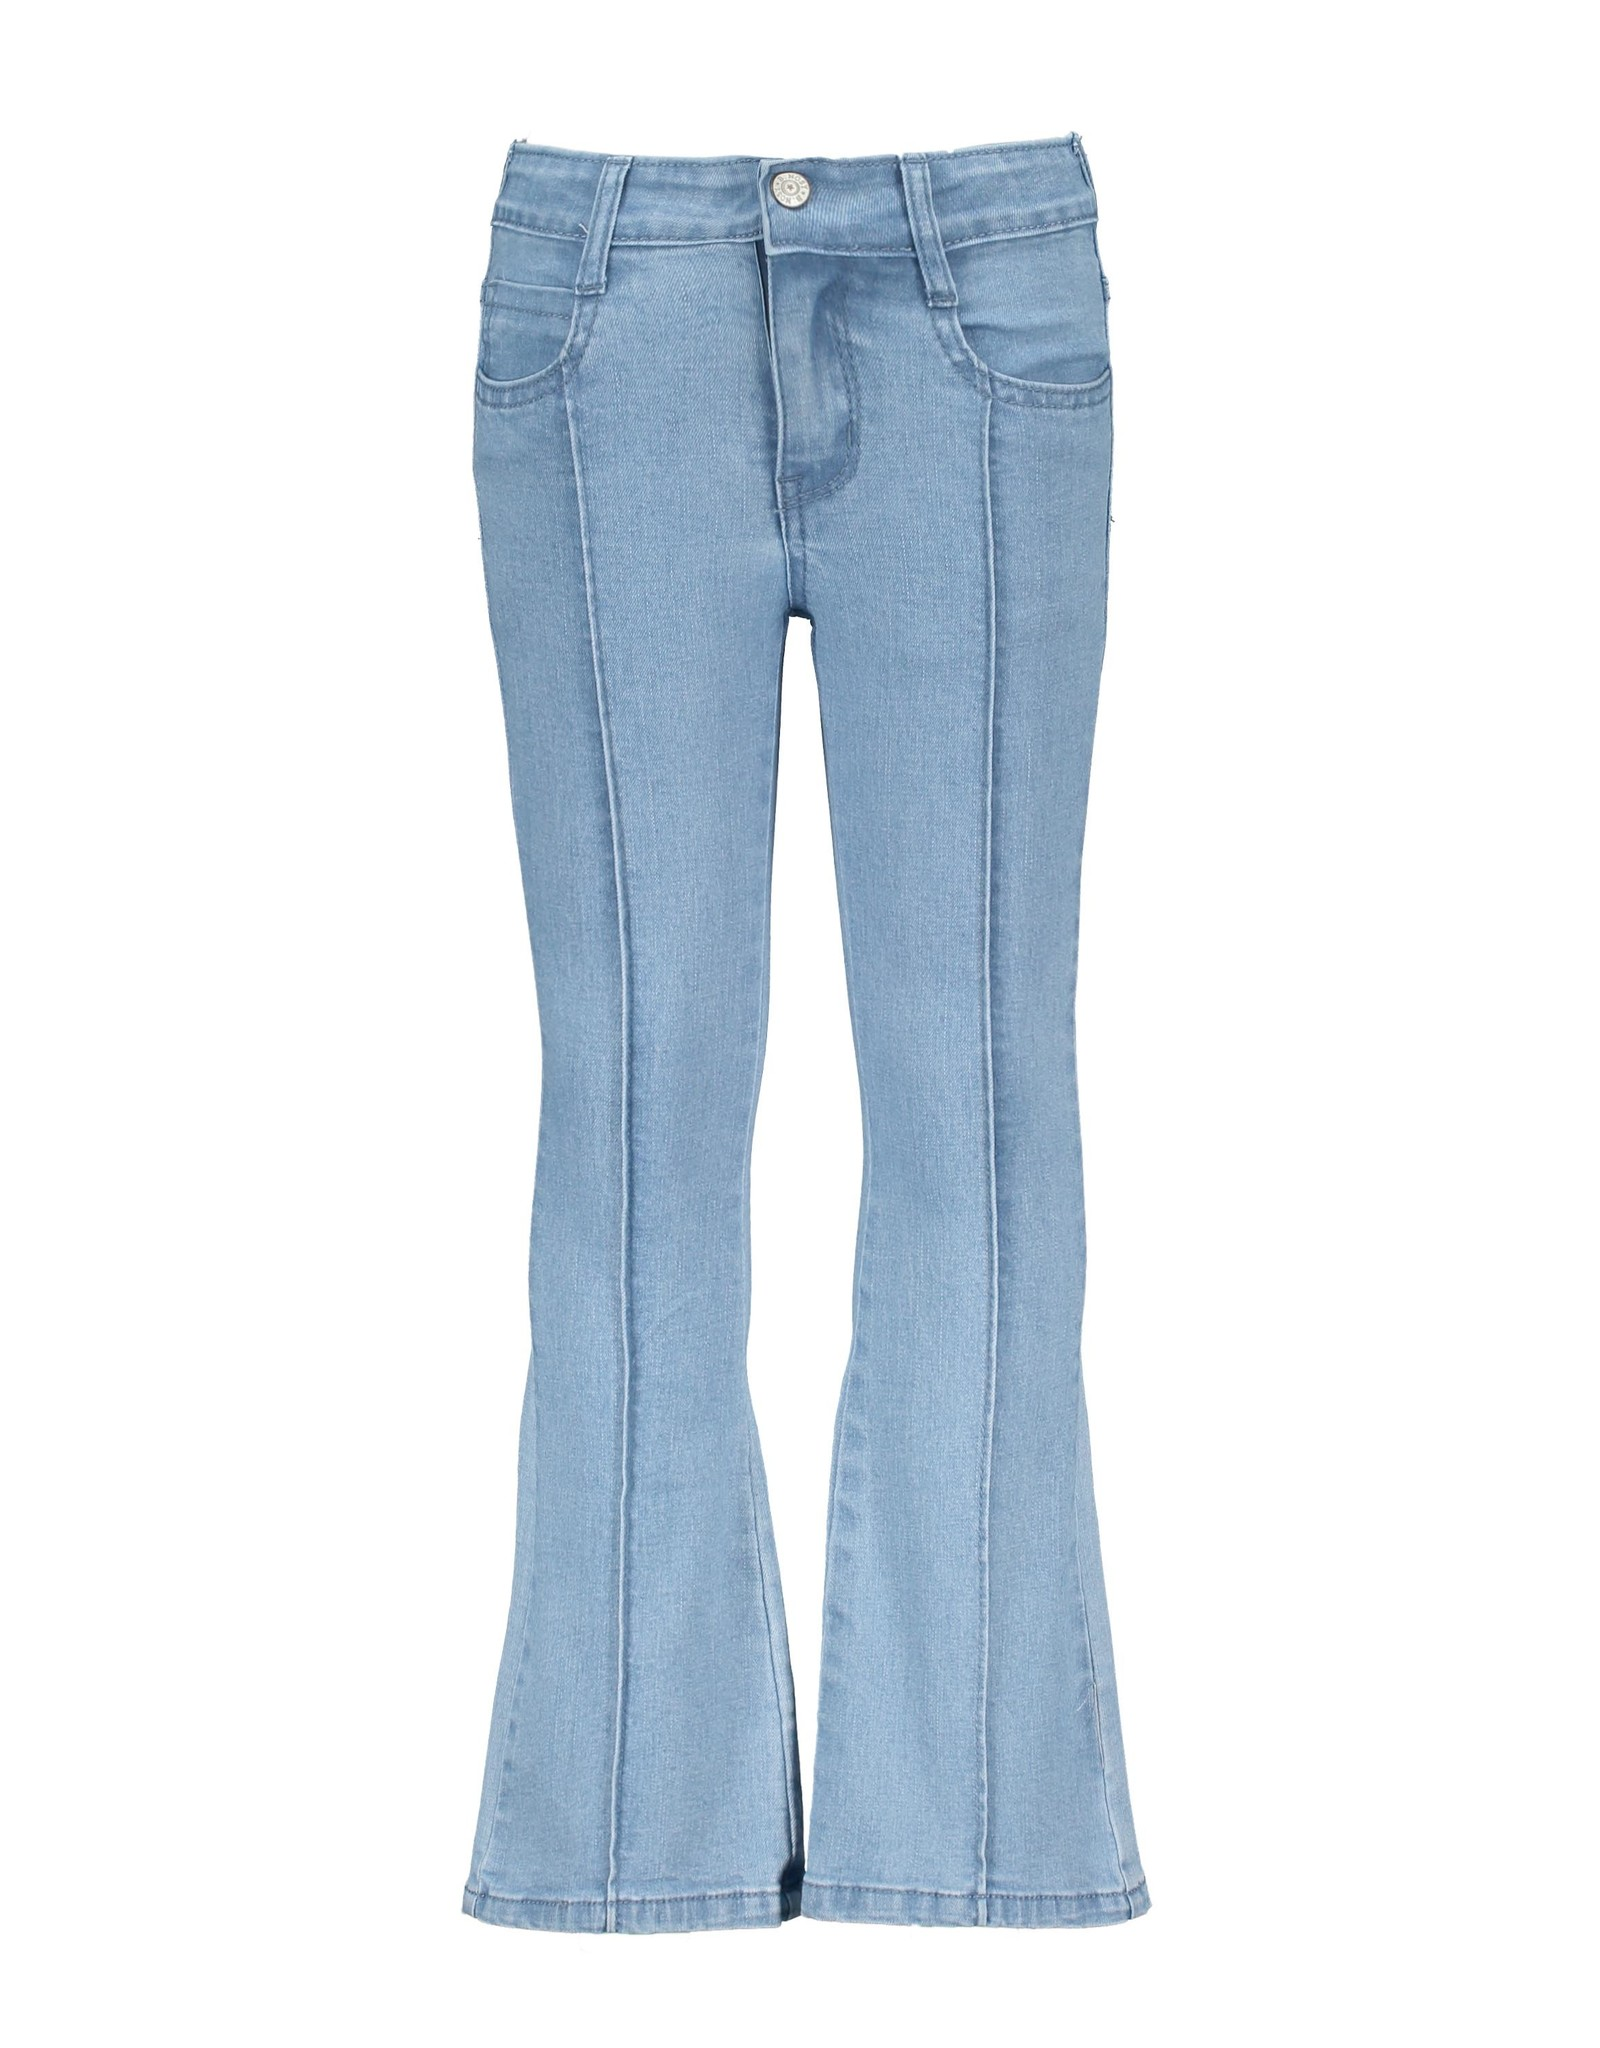 B.Nosy Girls denim flair pants, ruffles at front pockets